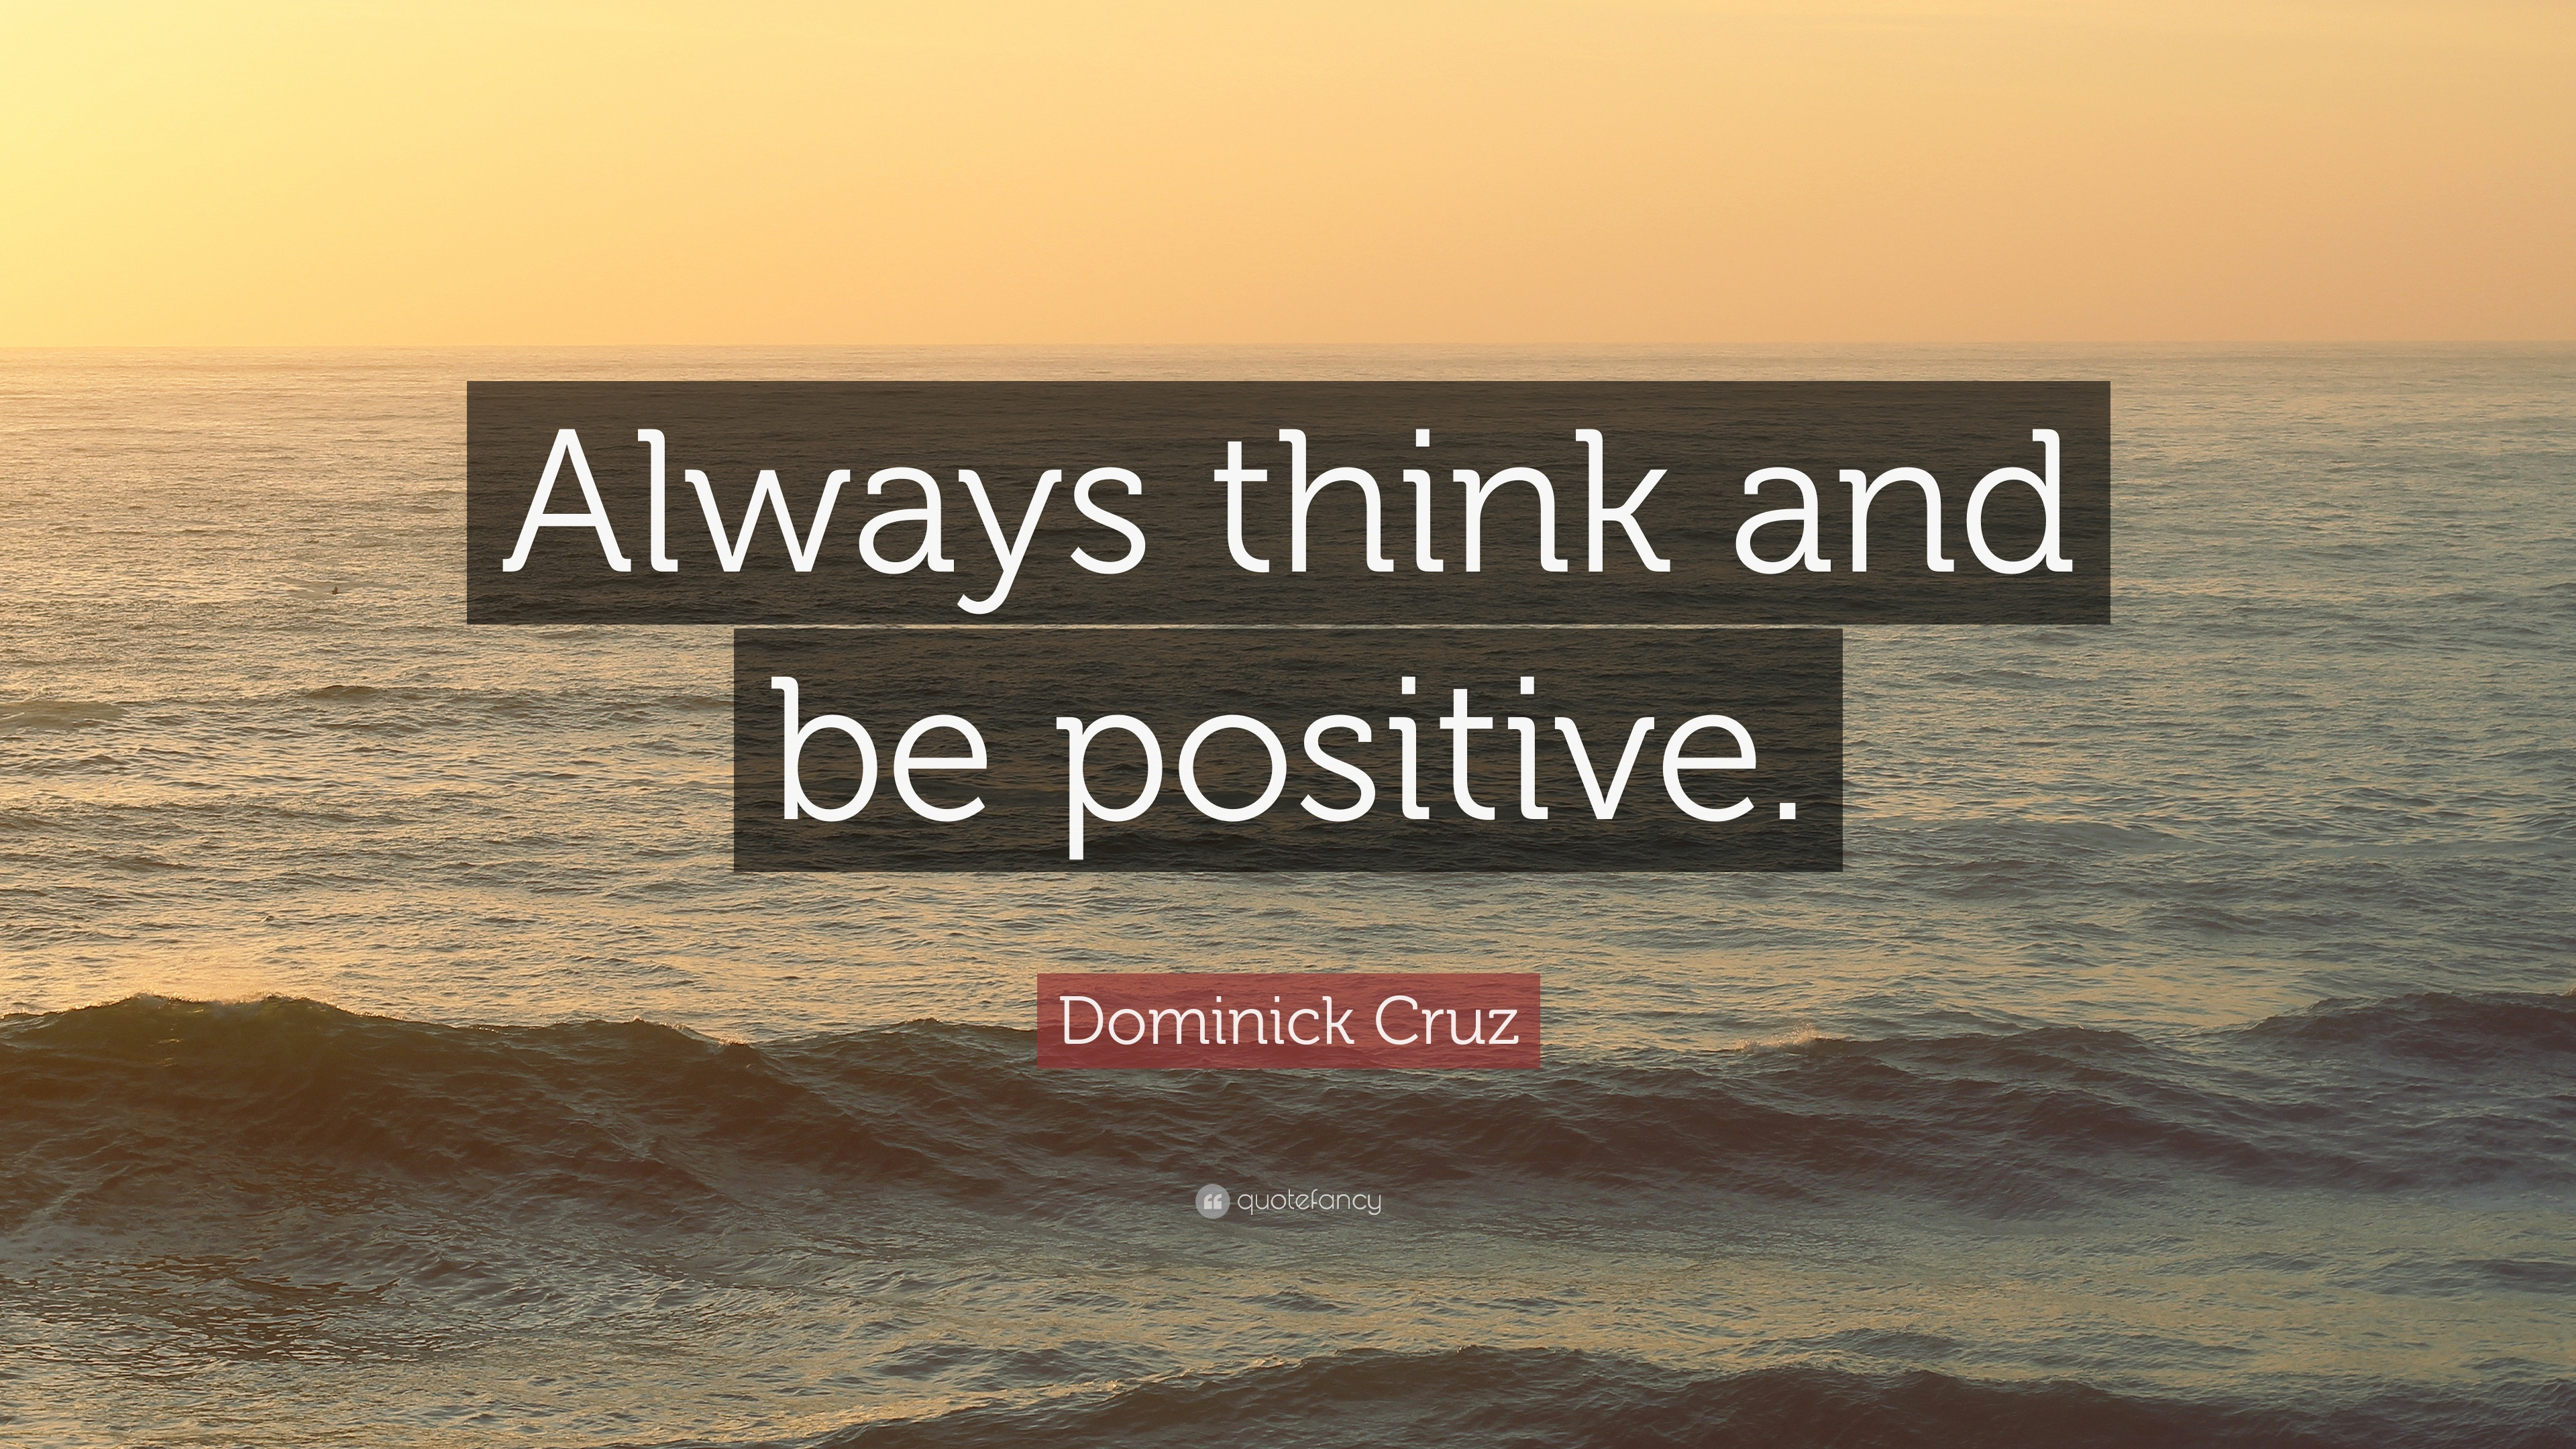 Always Be Positive Quotes  Dominick Cruz Quotes 8 wallpapers Quotefancy